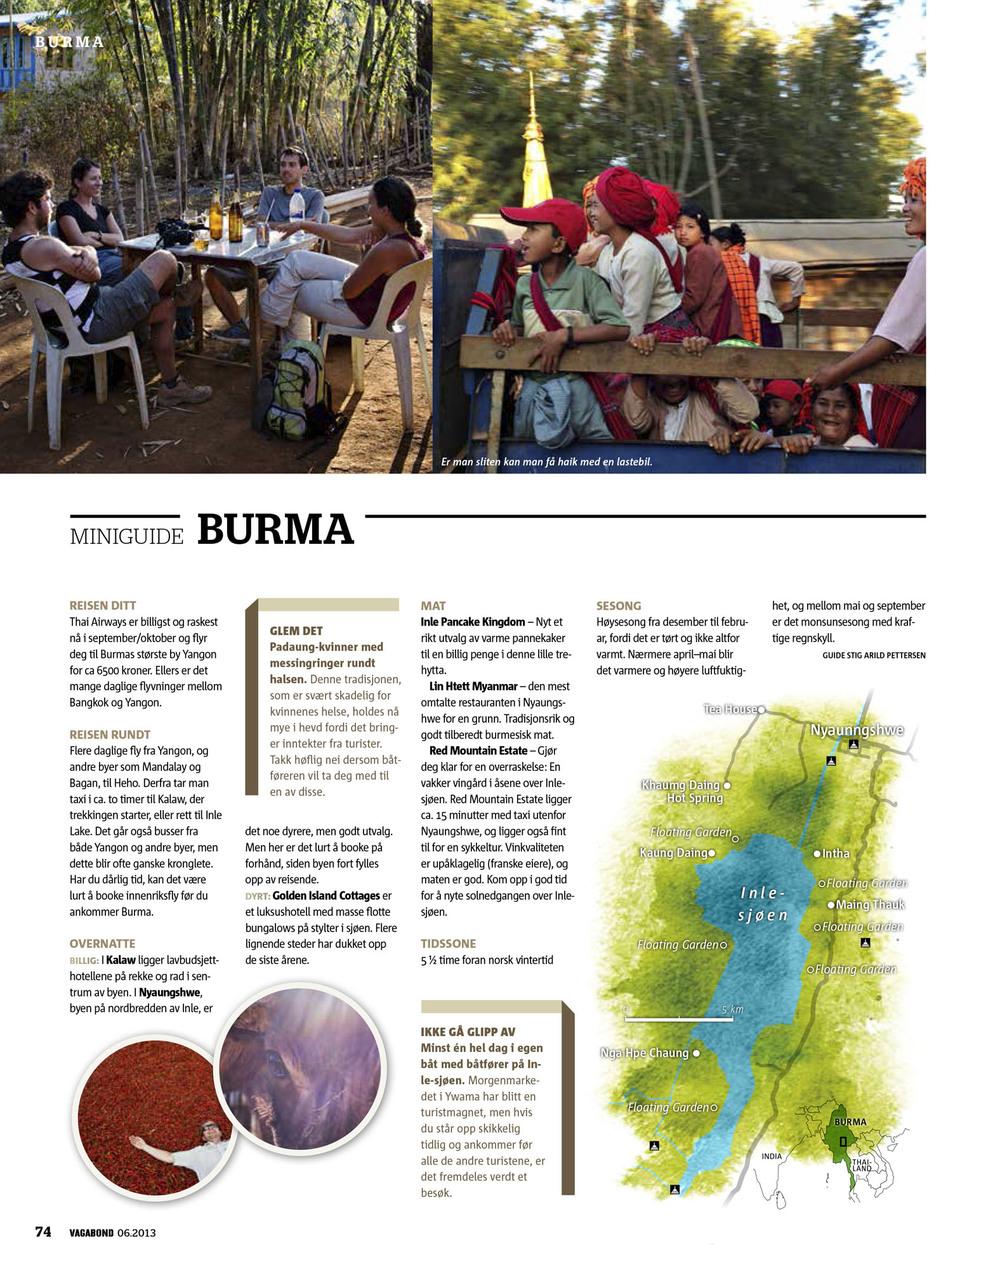 027-2013Vagabond_Burma-5.jpg